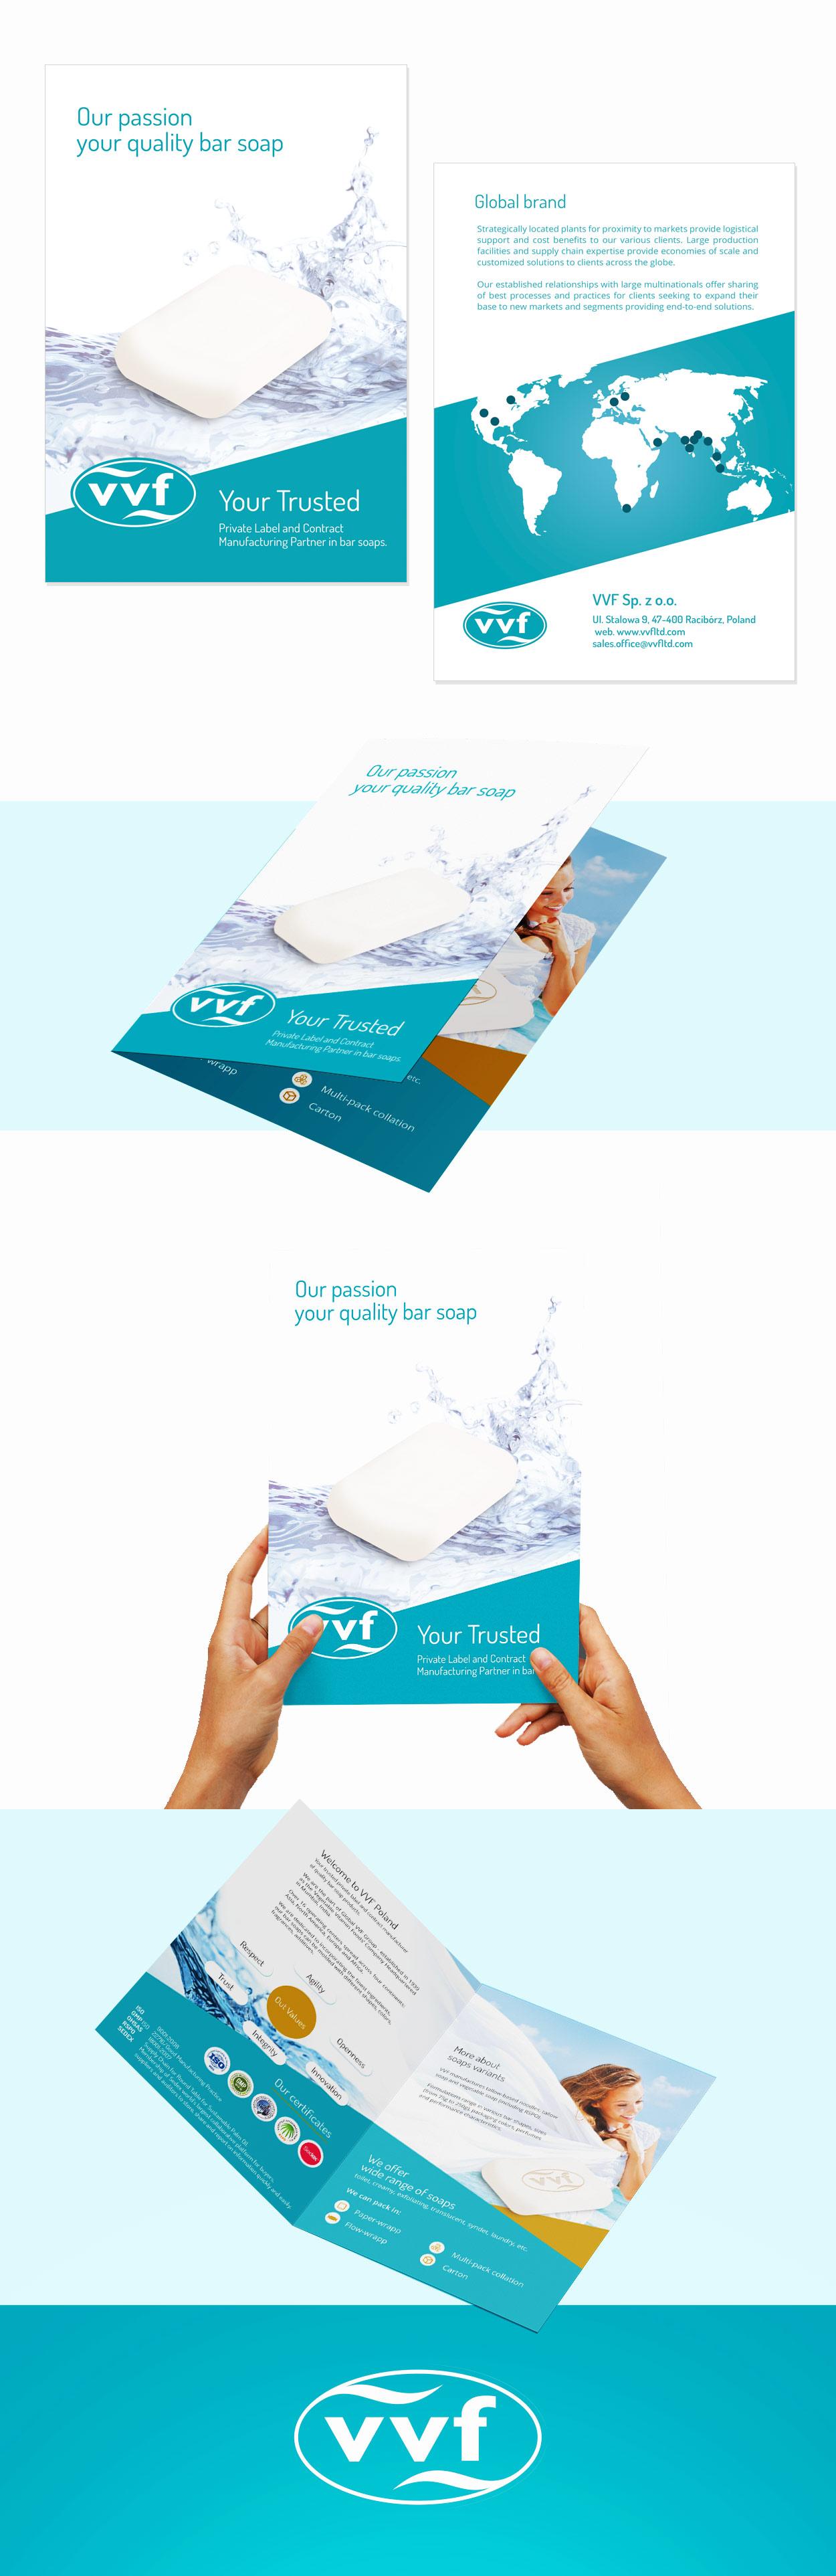 projekt-ulotki-reklamowej-vvf